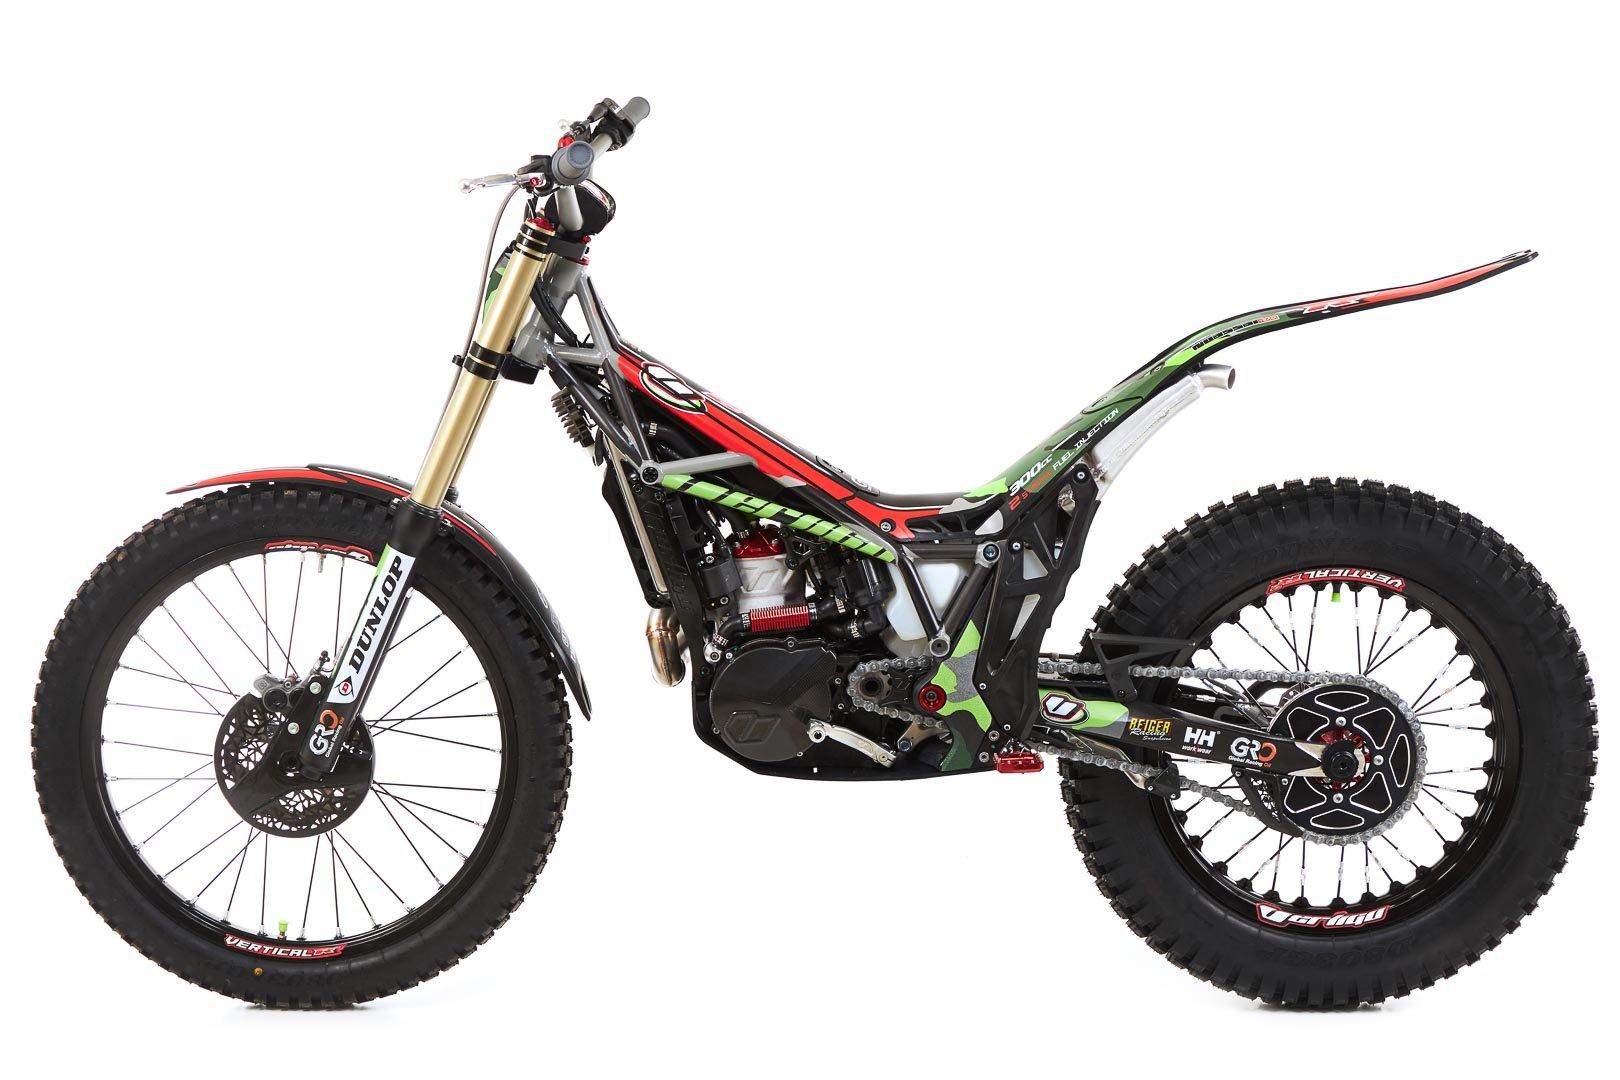 2020 Vertigo Vertical R2 First Look - observed trials motorcycle